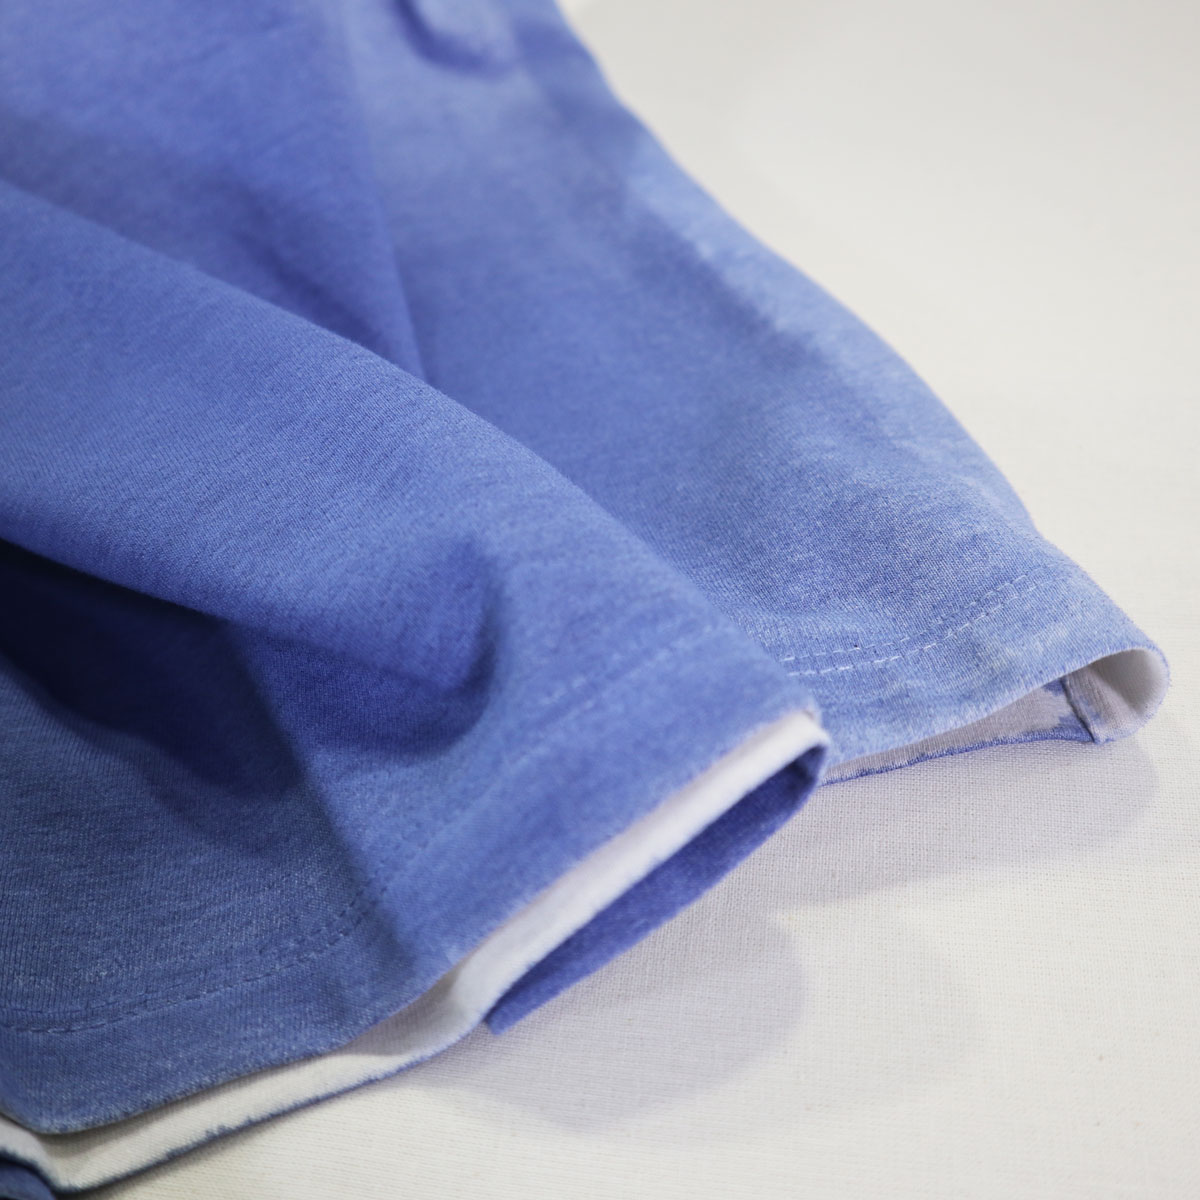 Danga Rodaballo model. Organic cotton hand dyed blue t-shit